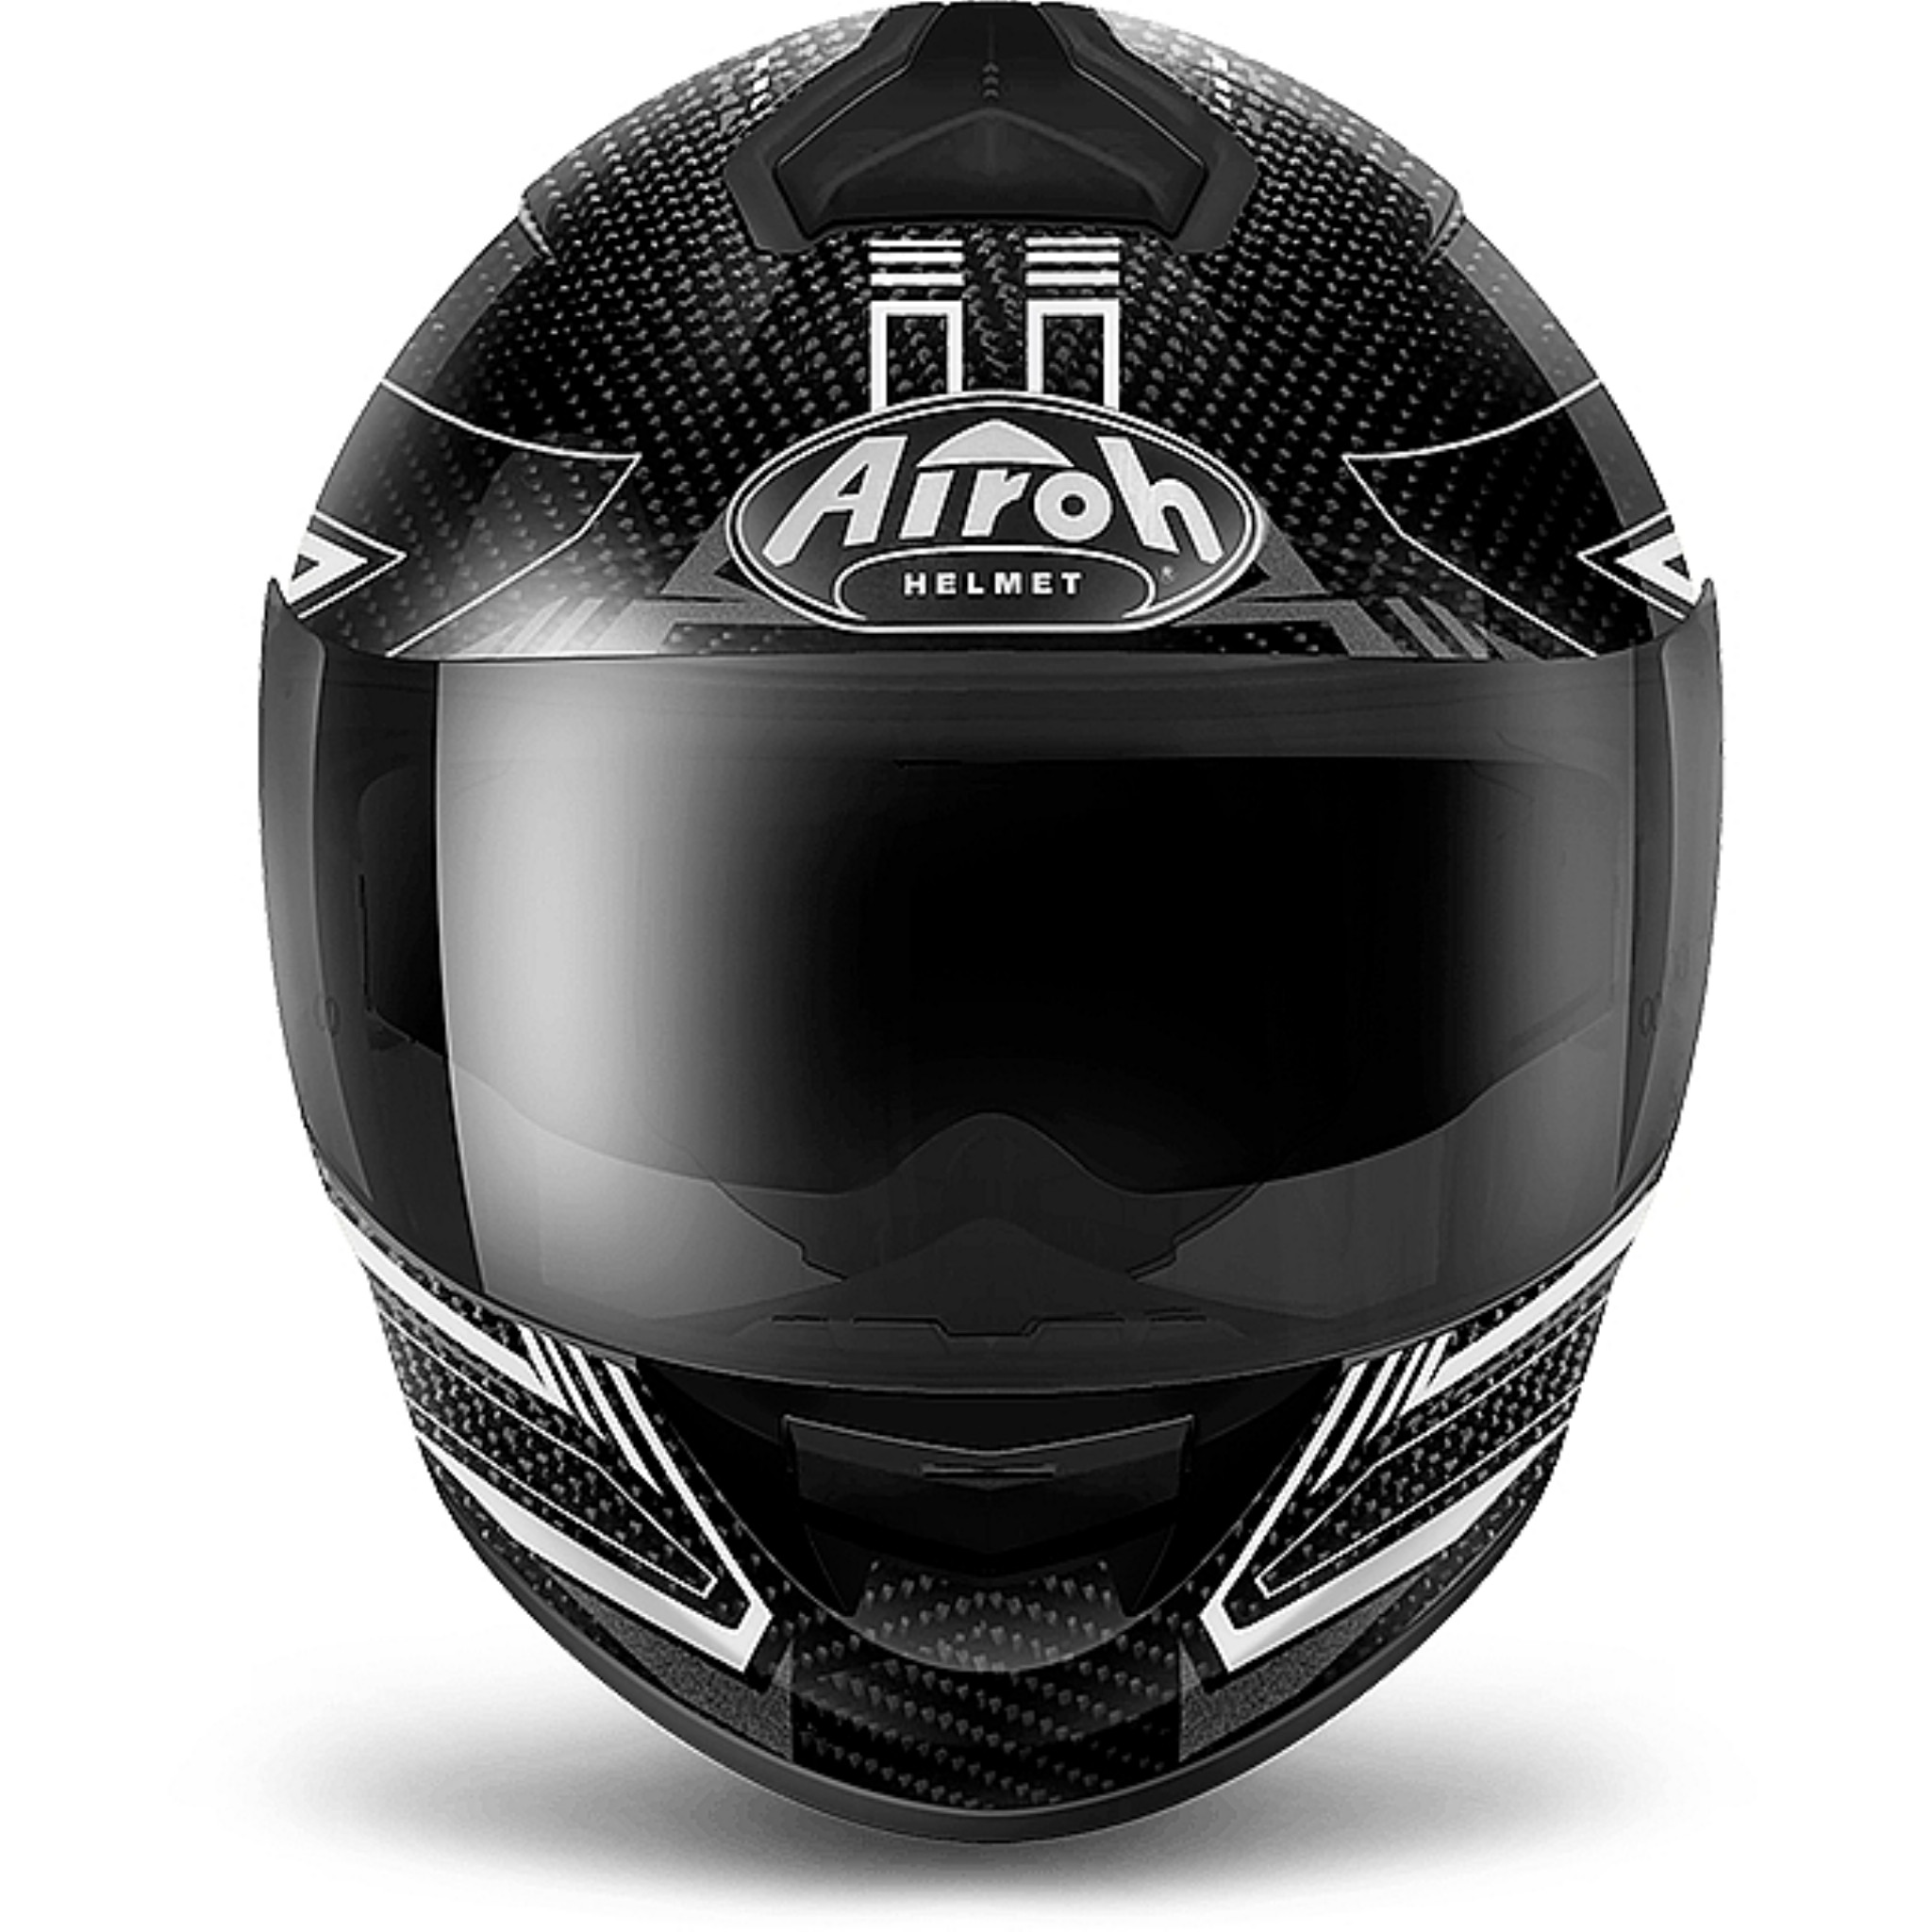 Airoh Шлем интеграл St 701 черный карбон